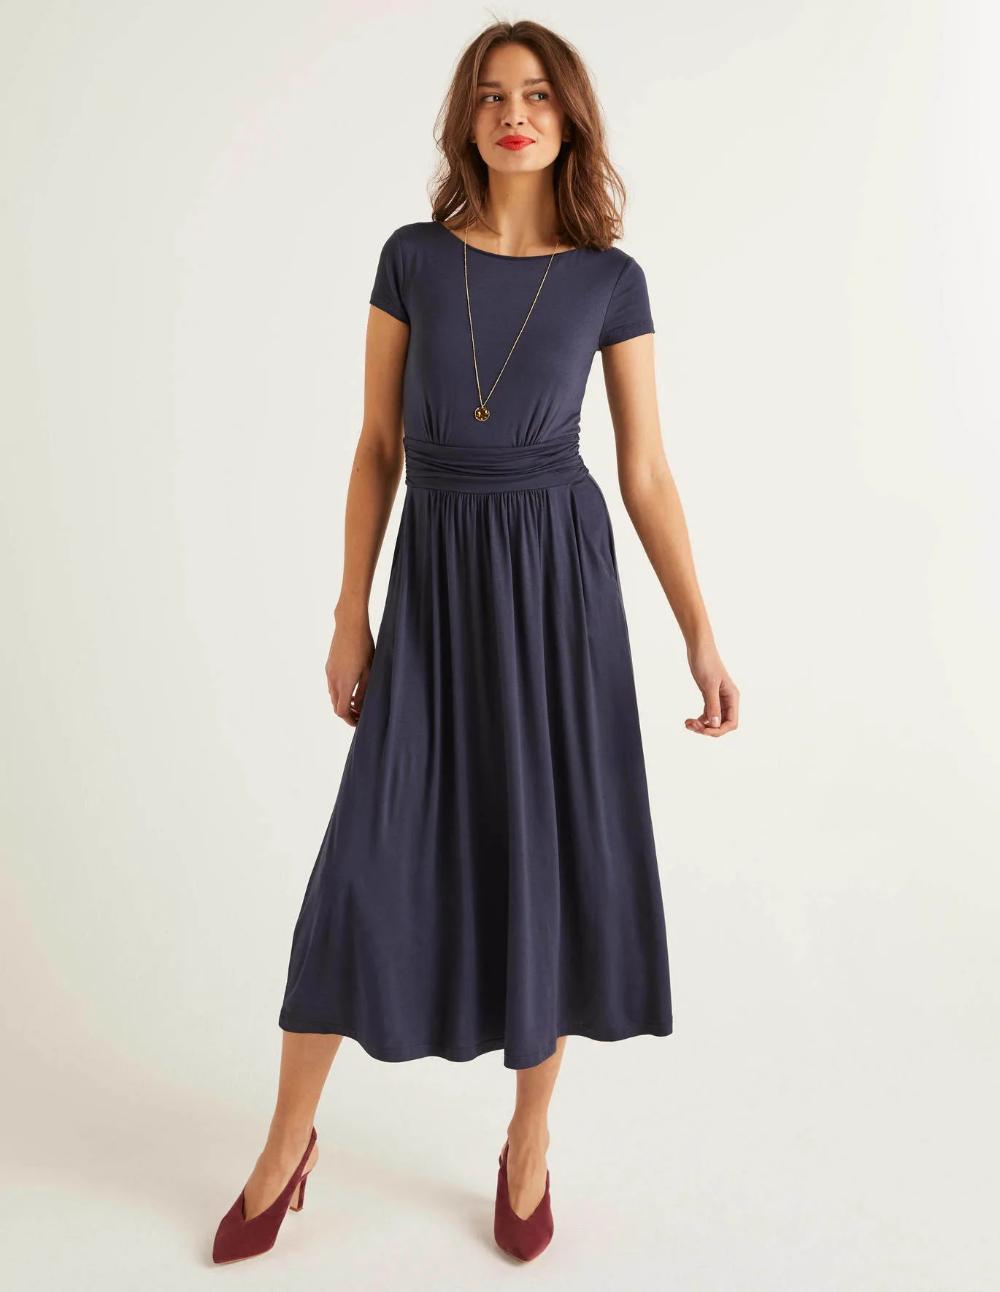 Faye Jersey Midi Dress Navy Navy Midi Dress Midi Dress Burgundy Midi Dress [ 1292 x 1000 Pixel ]